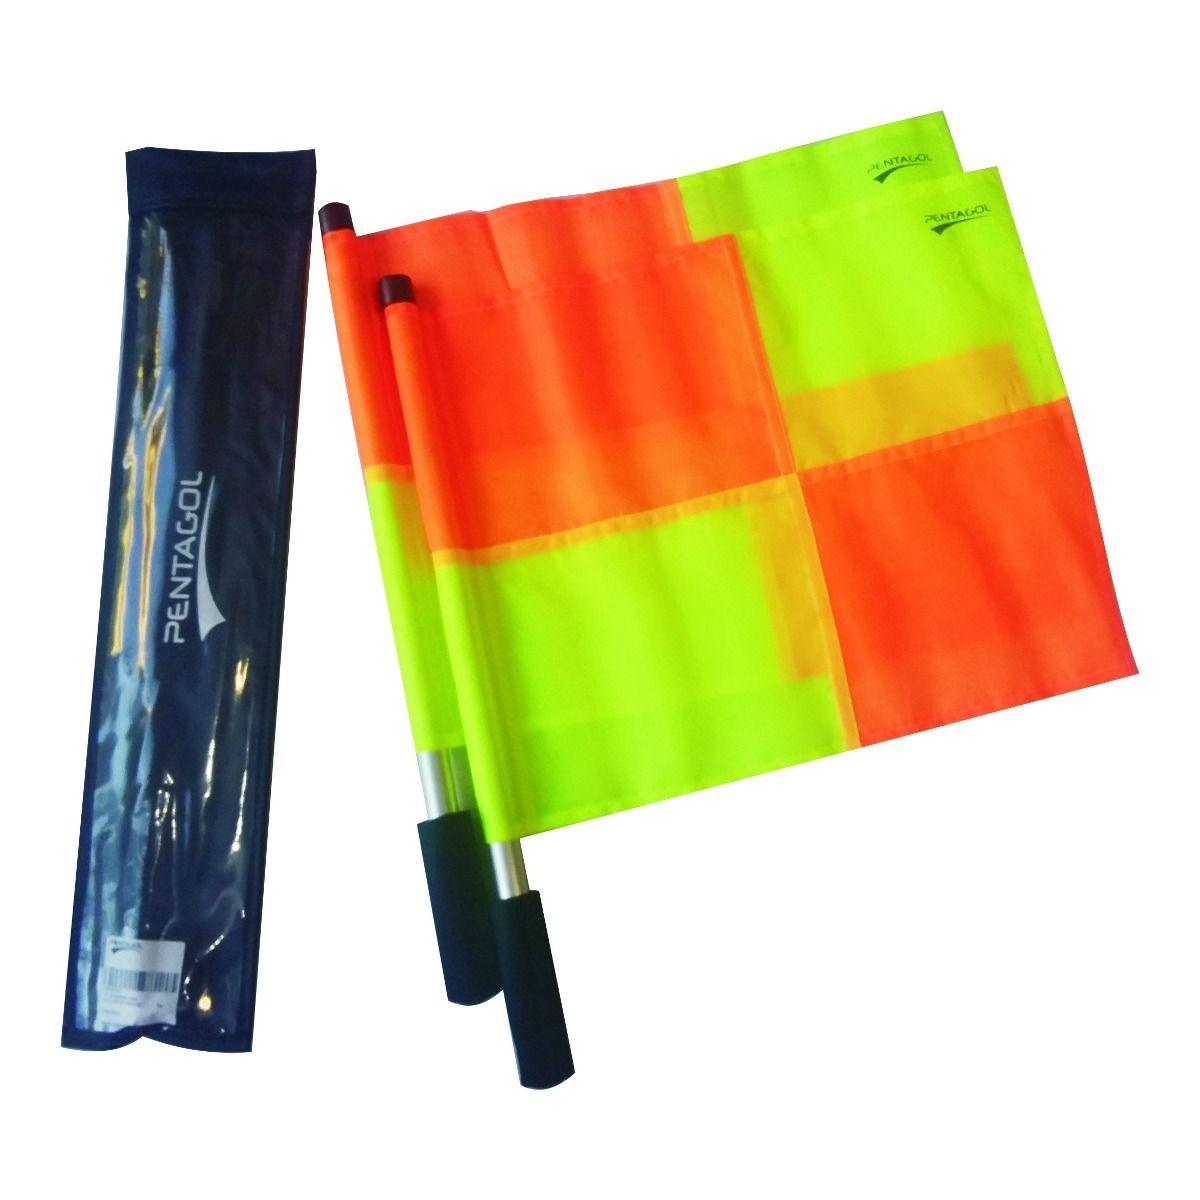 Kit Bandeira de Auxiliar Árbitro / Bandeirinha - 4 Gomos - Par - Pentagol